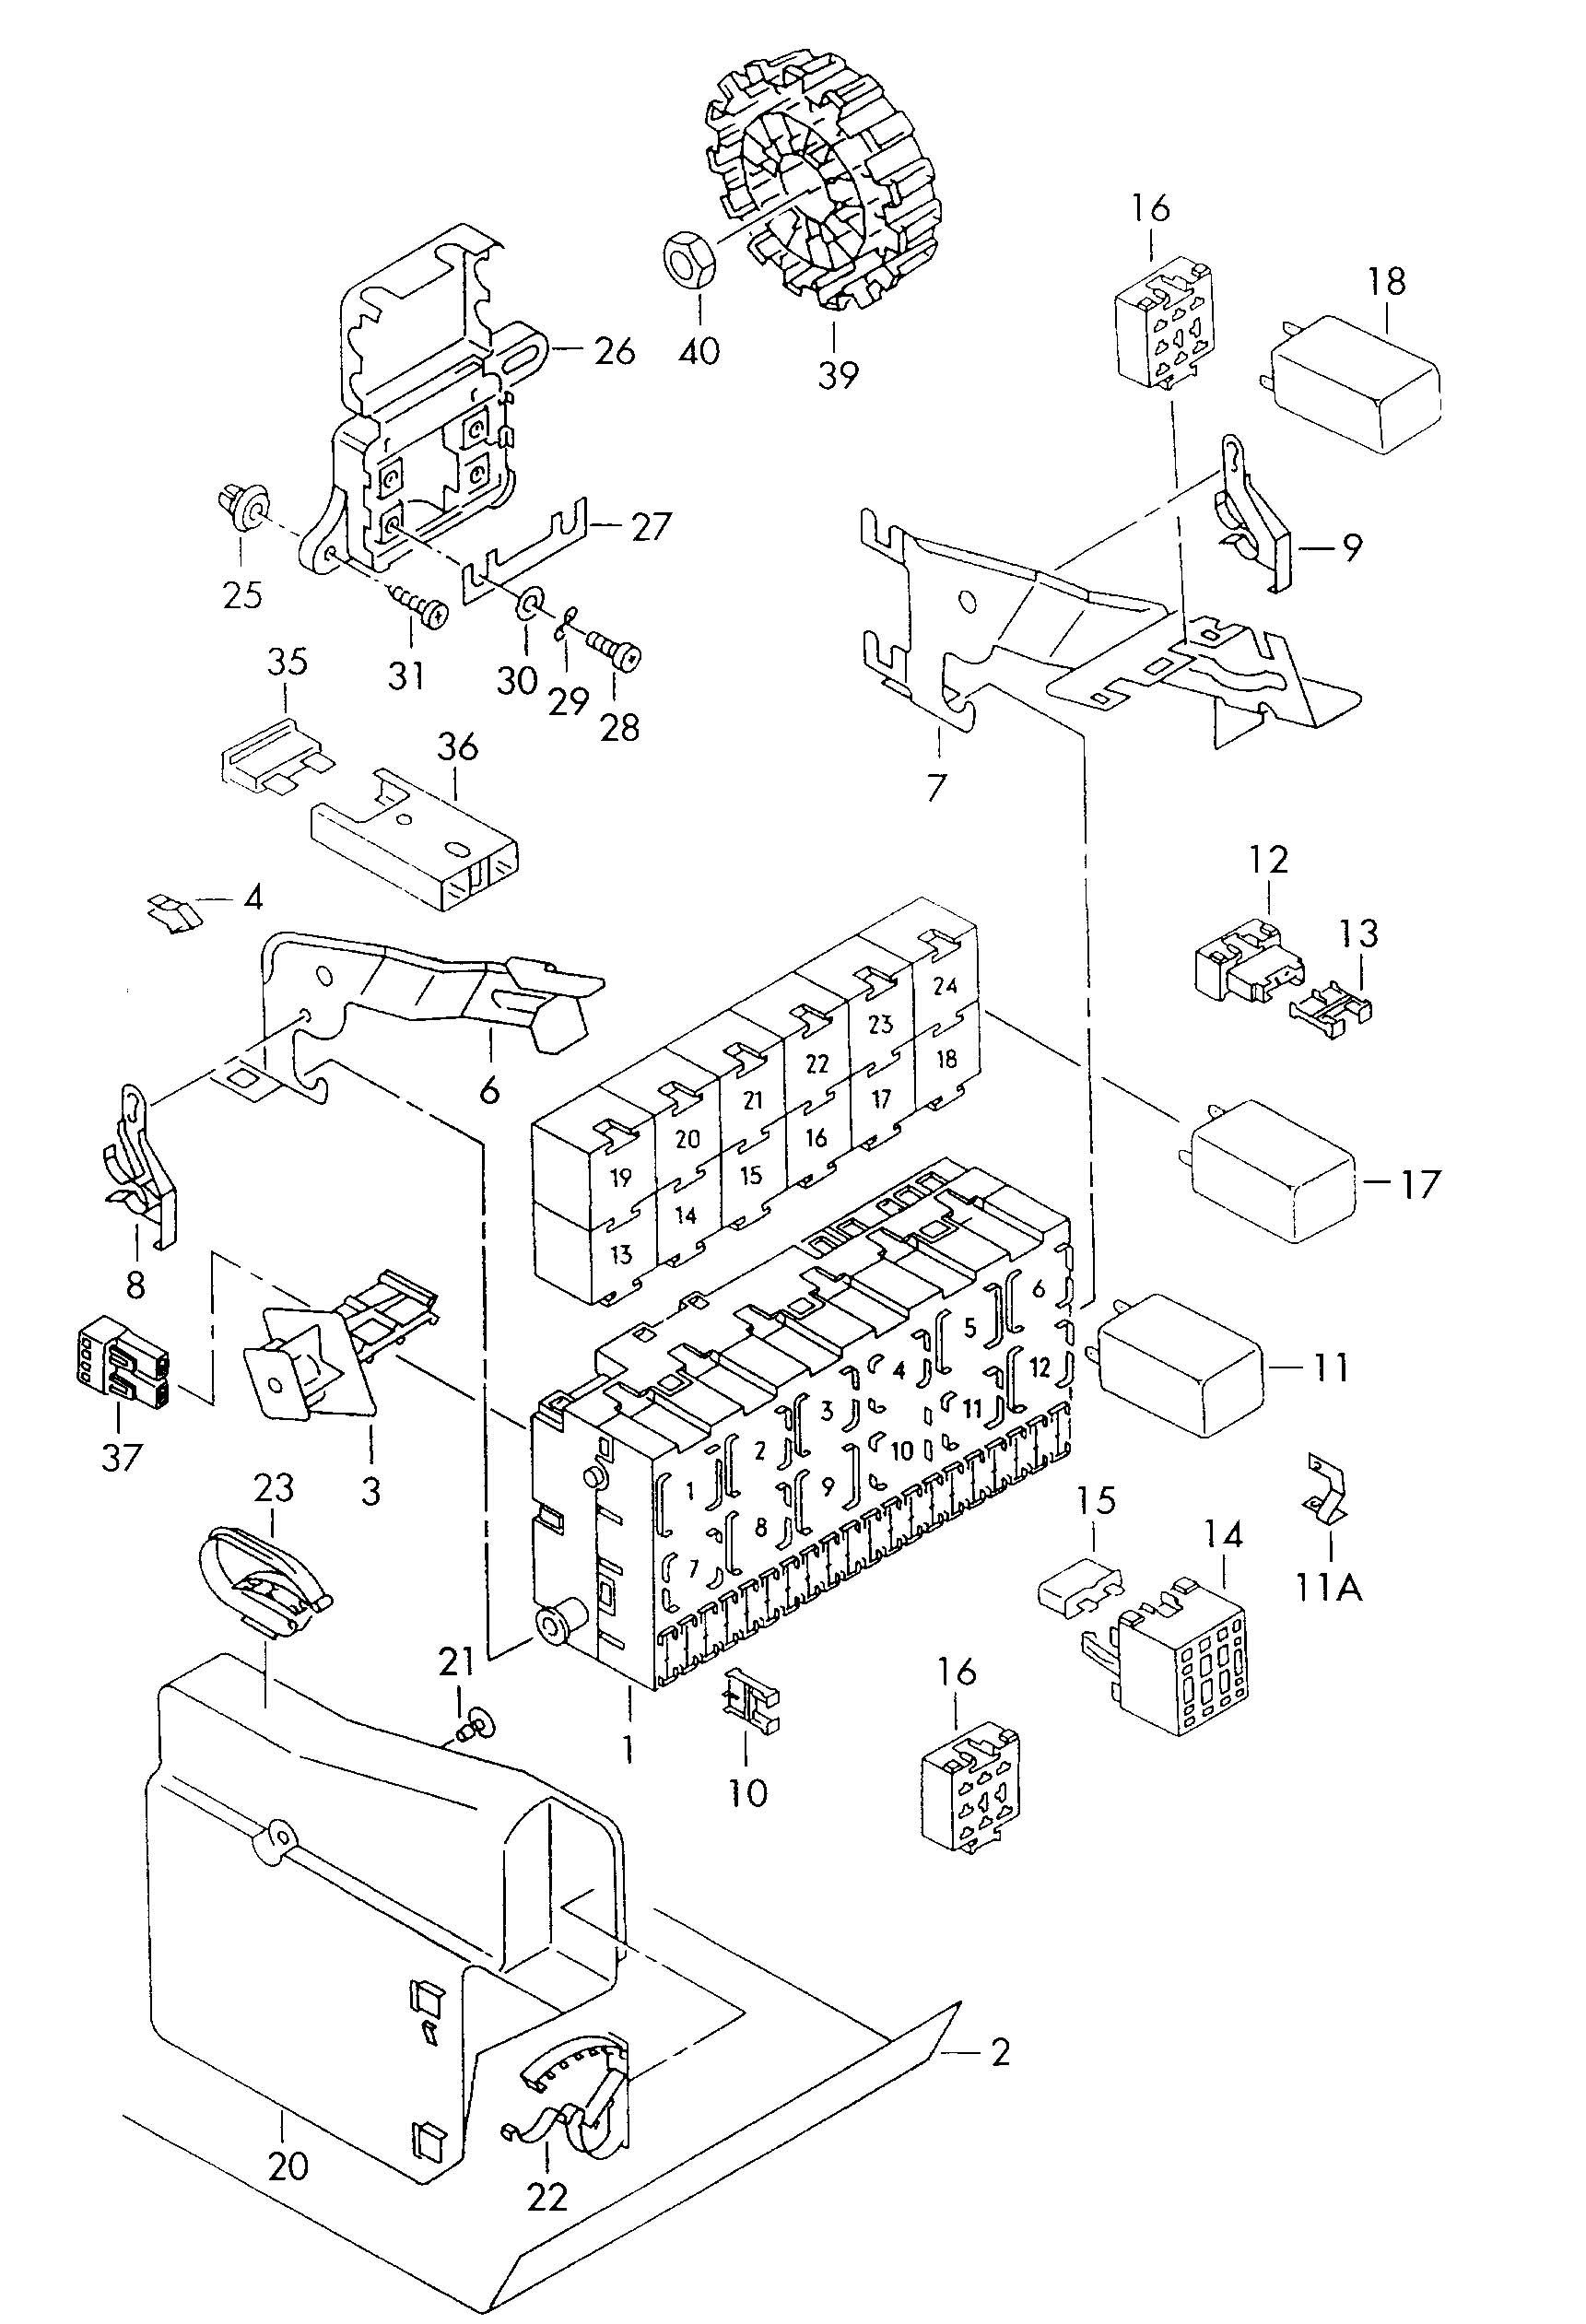 vw eos parts diagram wiring trailer 7 pin plug jetta sportwagen 2011 fuse imageresizertool com